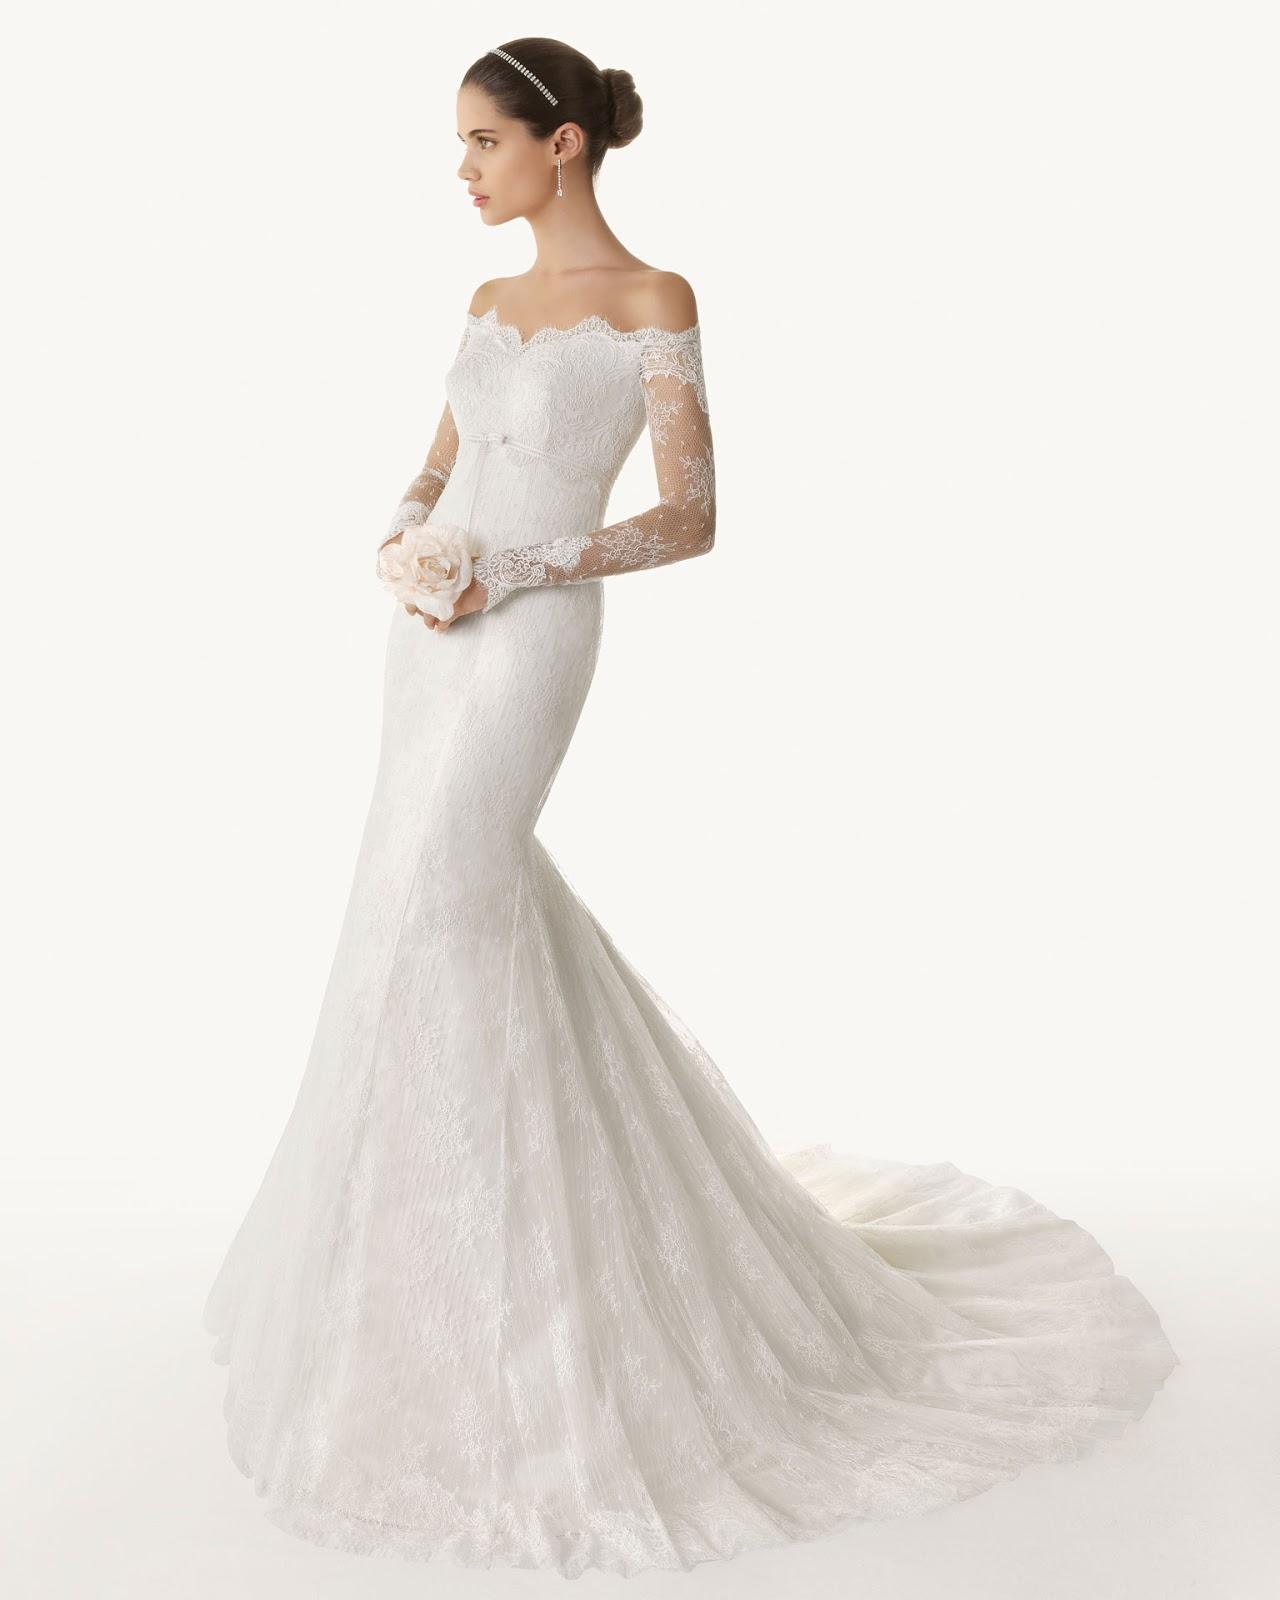 Cheap Wedding Gowns Online Blog: Spring 2013 Wedding ...